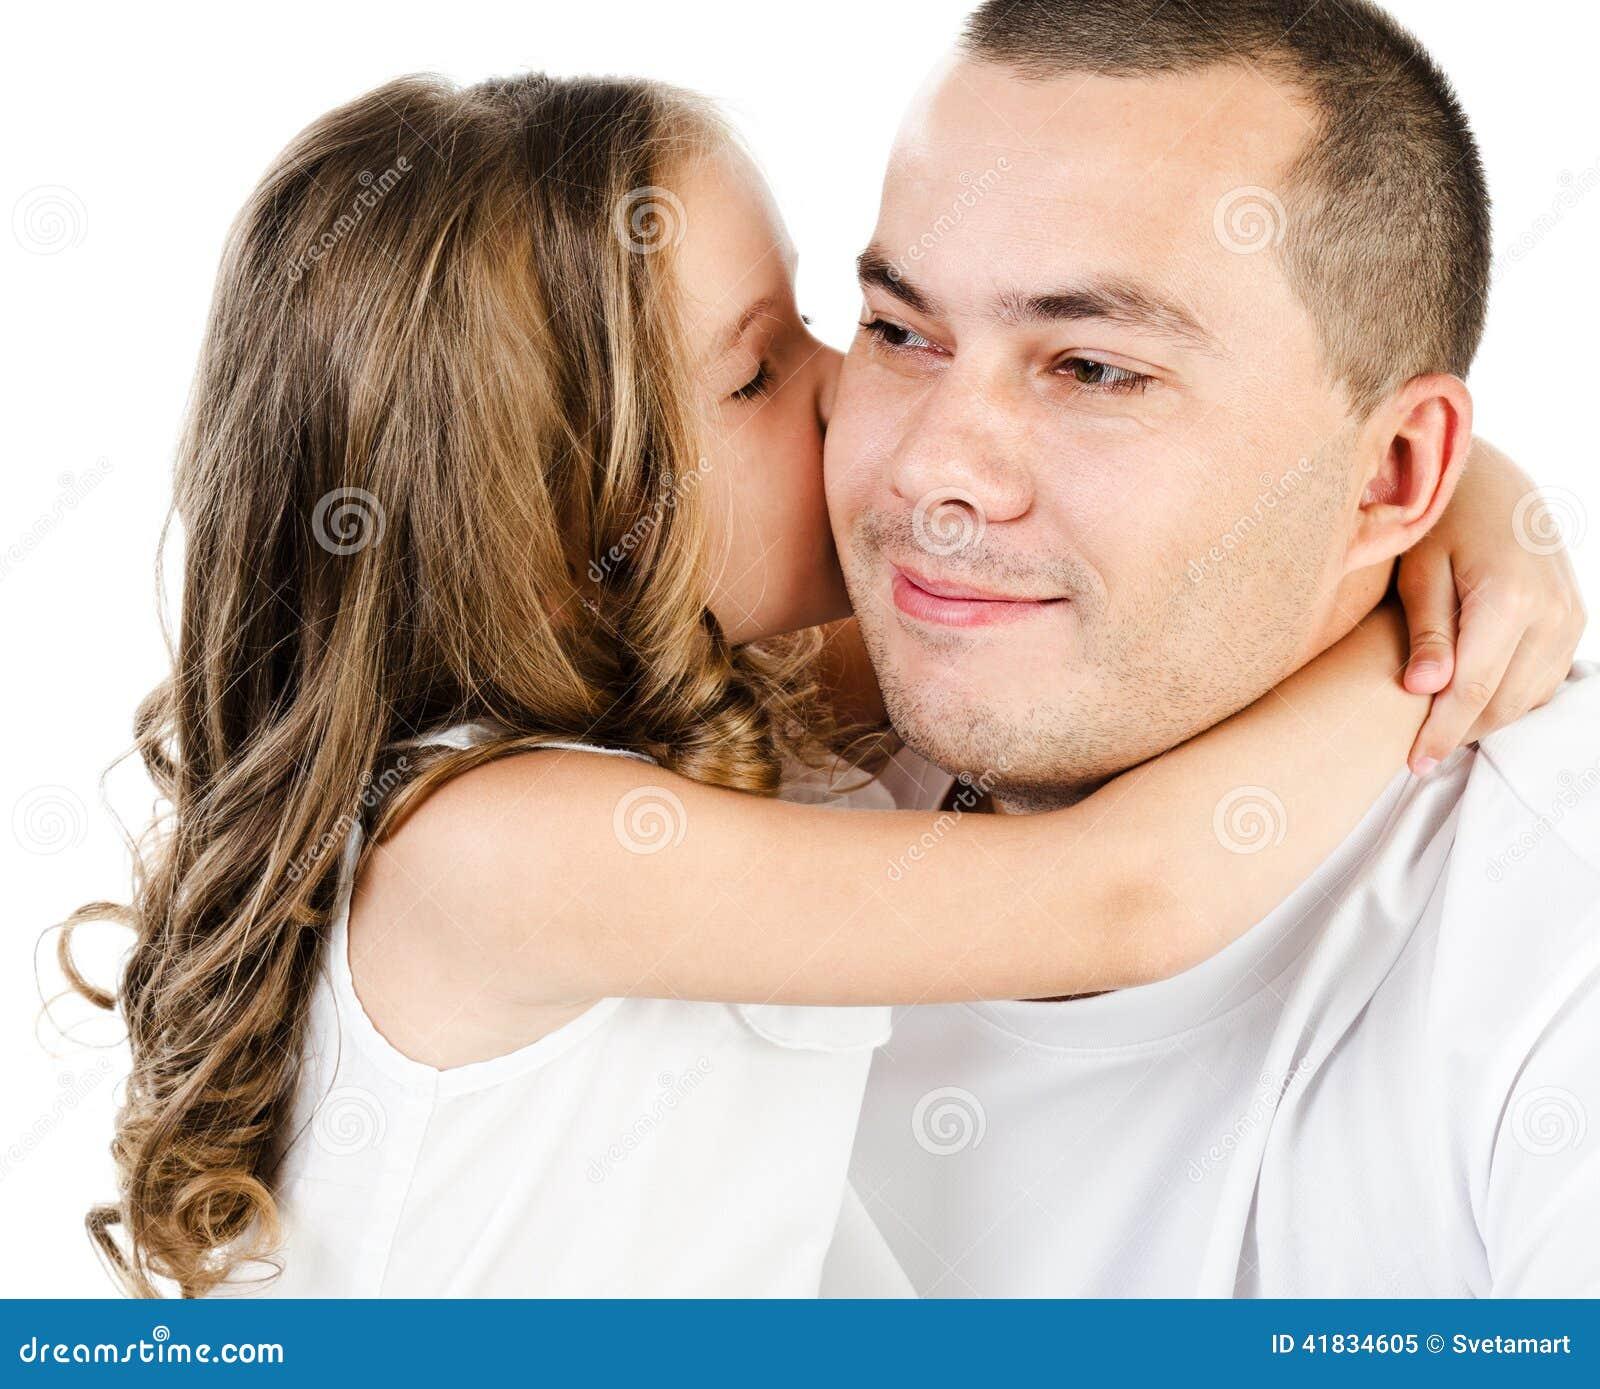 Indian woman kissing her white boyfriend desi nri 5